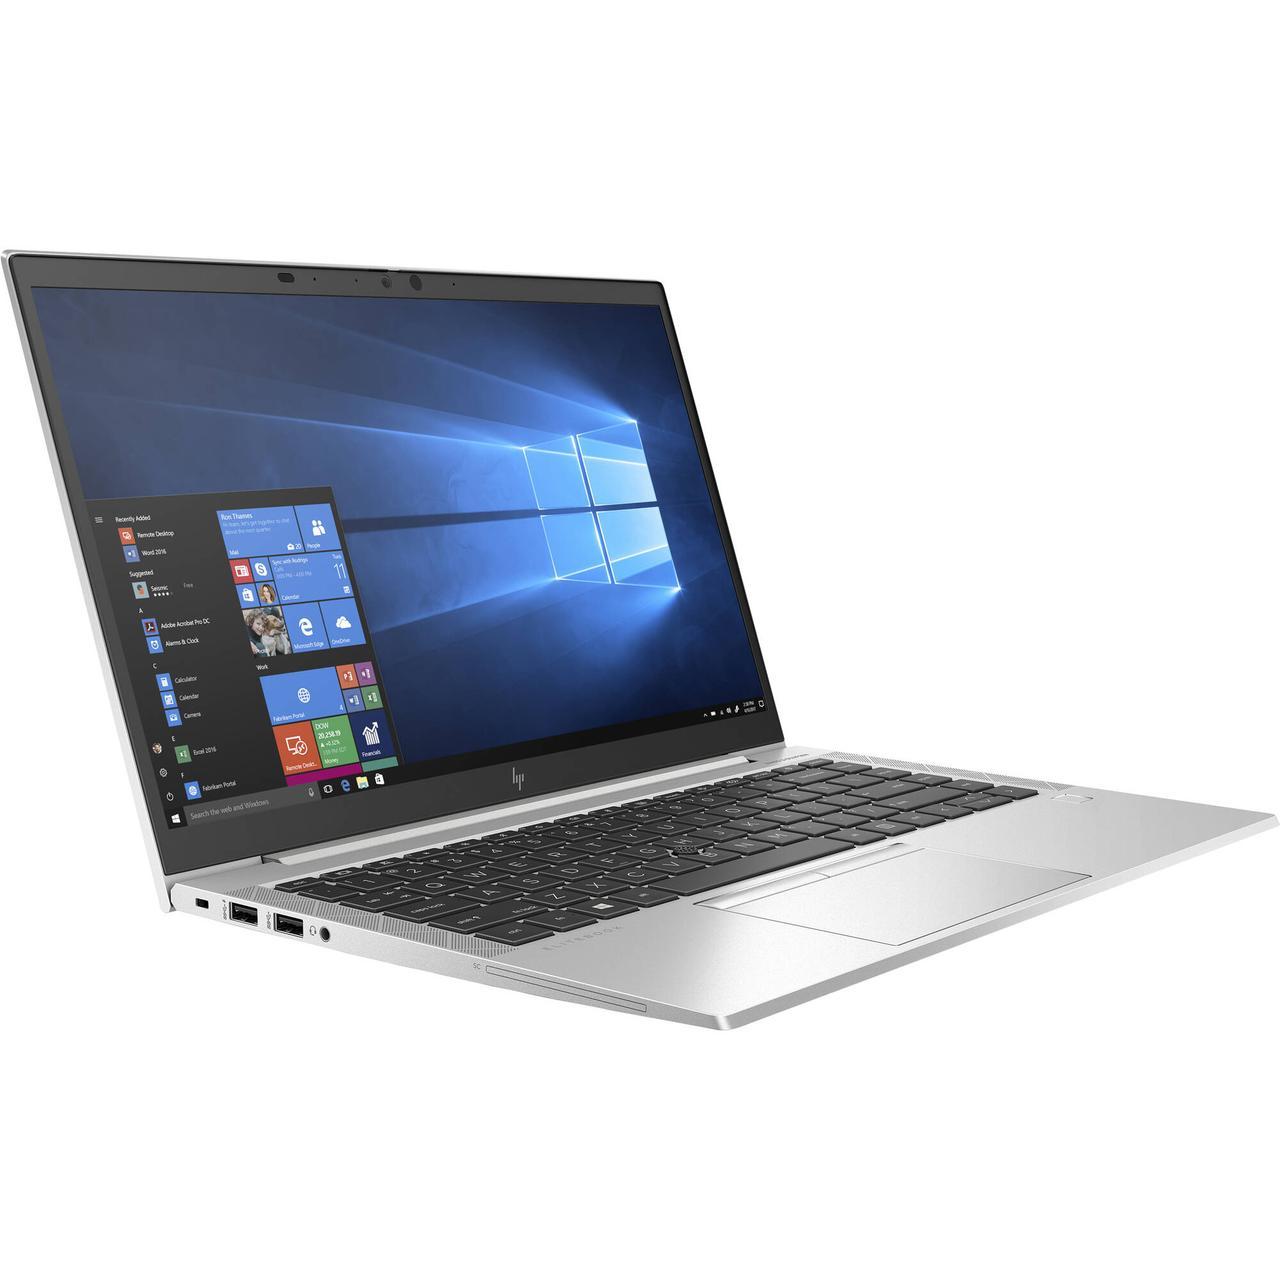 HP EliteBook 845 G7 (1W9D4UT#ABA)